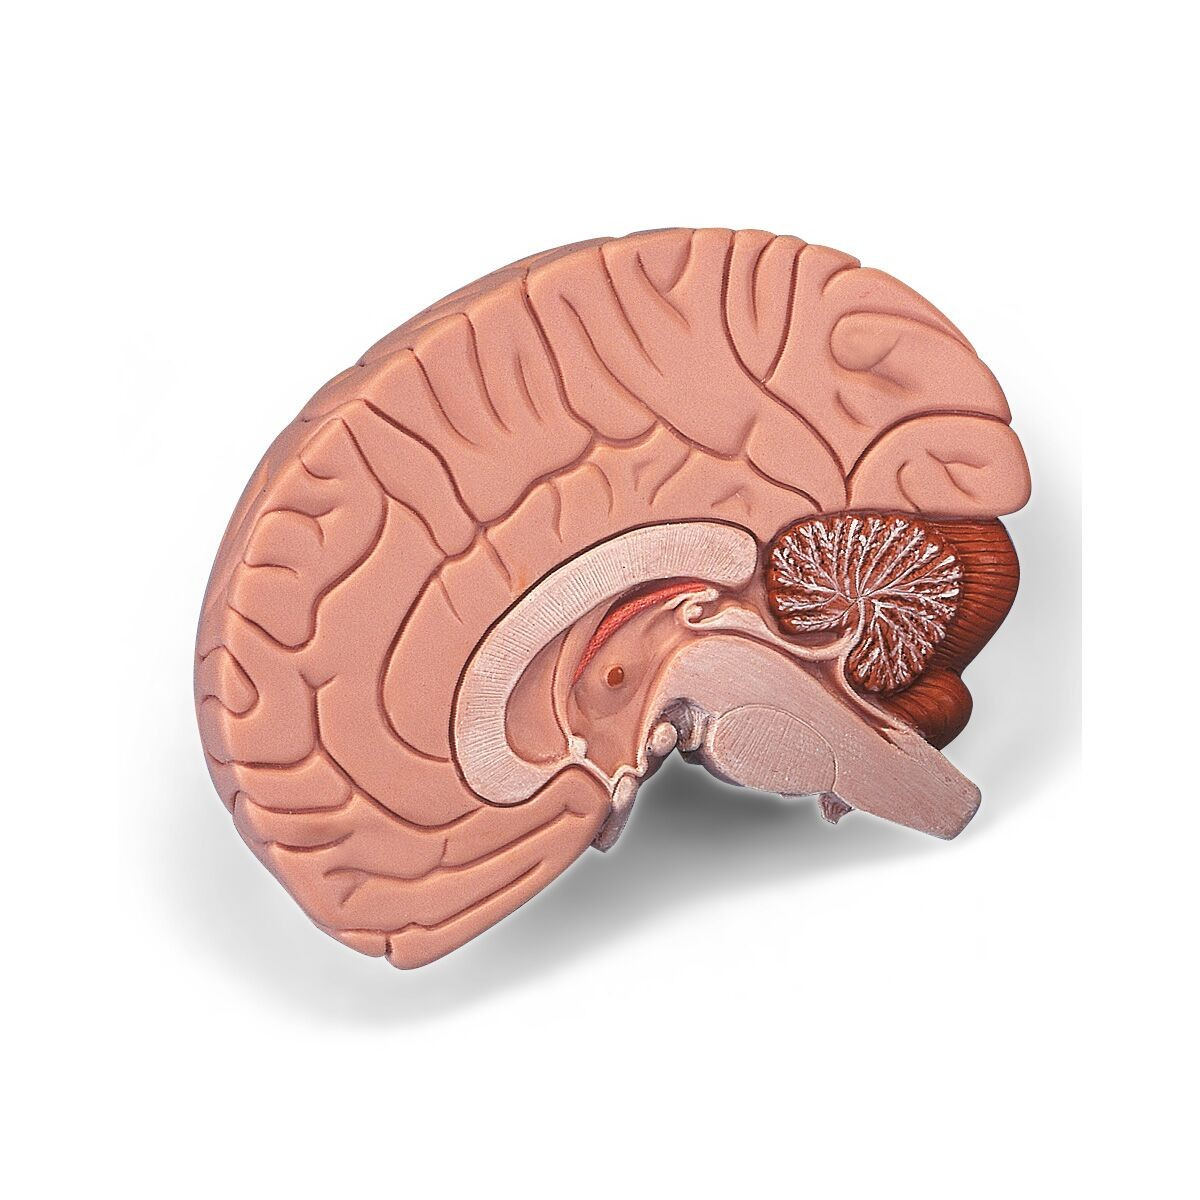 3B Brain - 2 Parts - Head, Brain, Nervous System - Human Anatomy ...